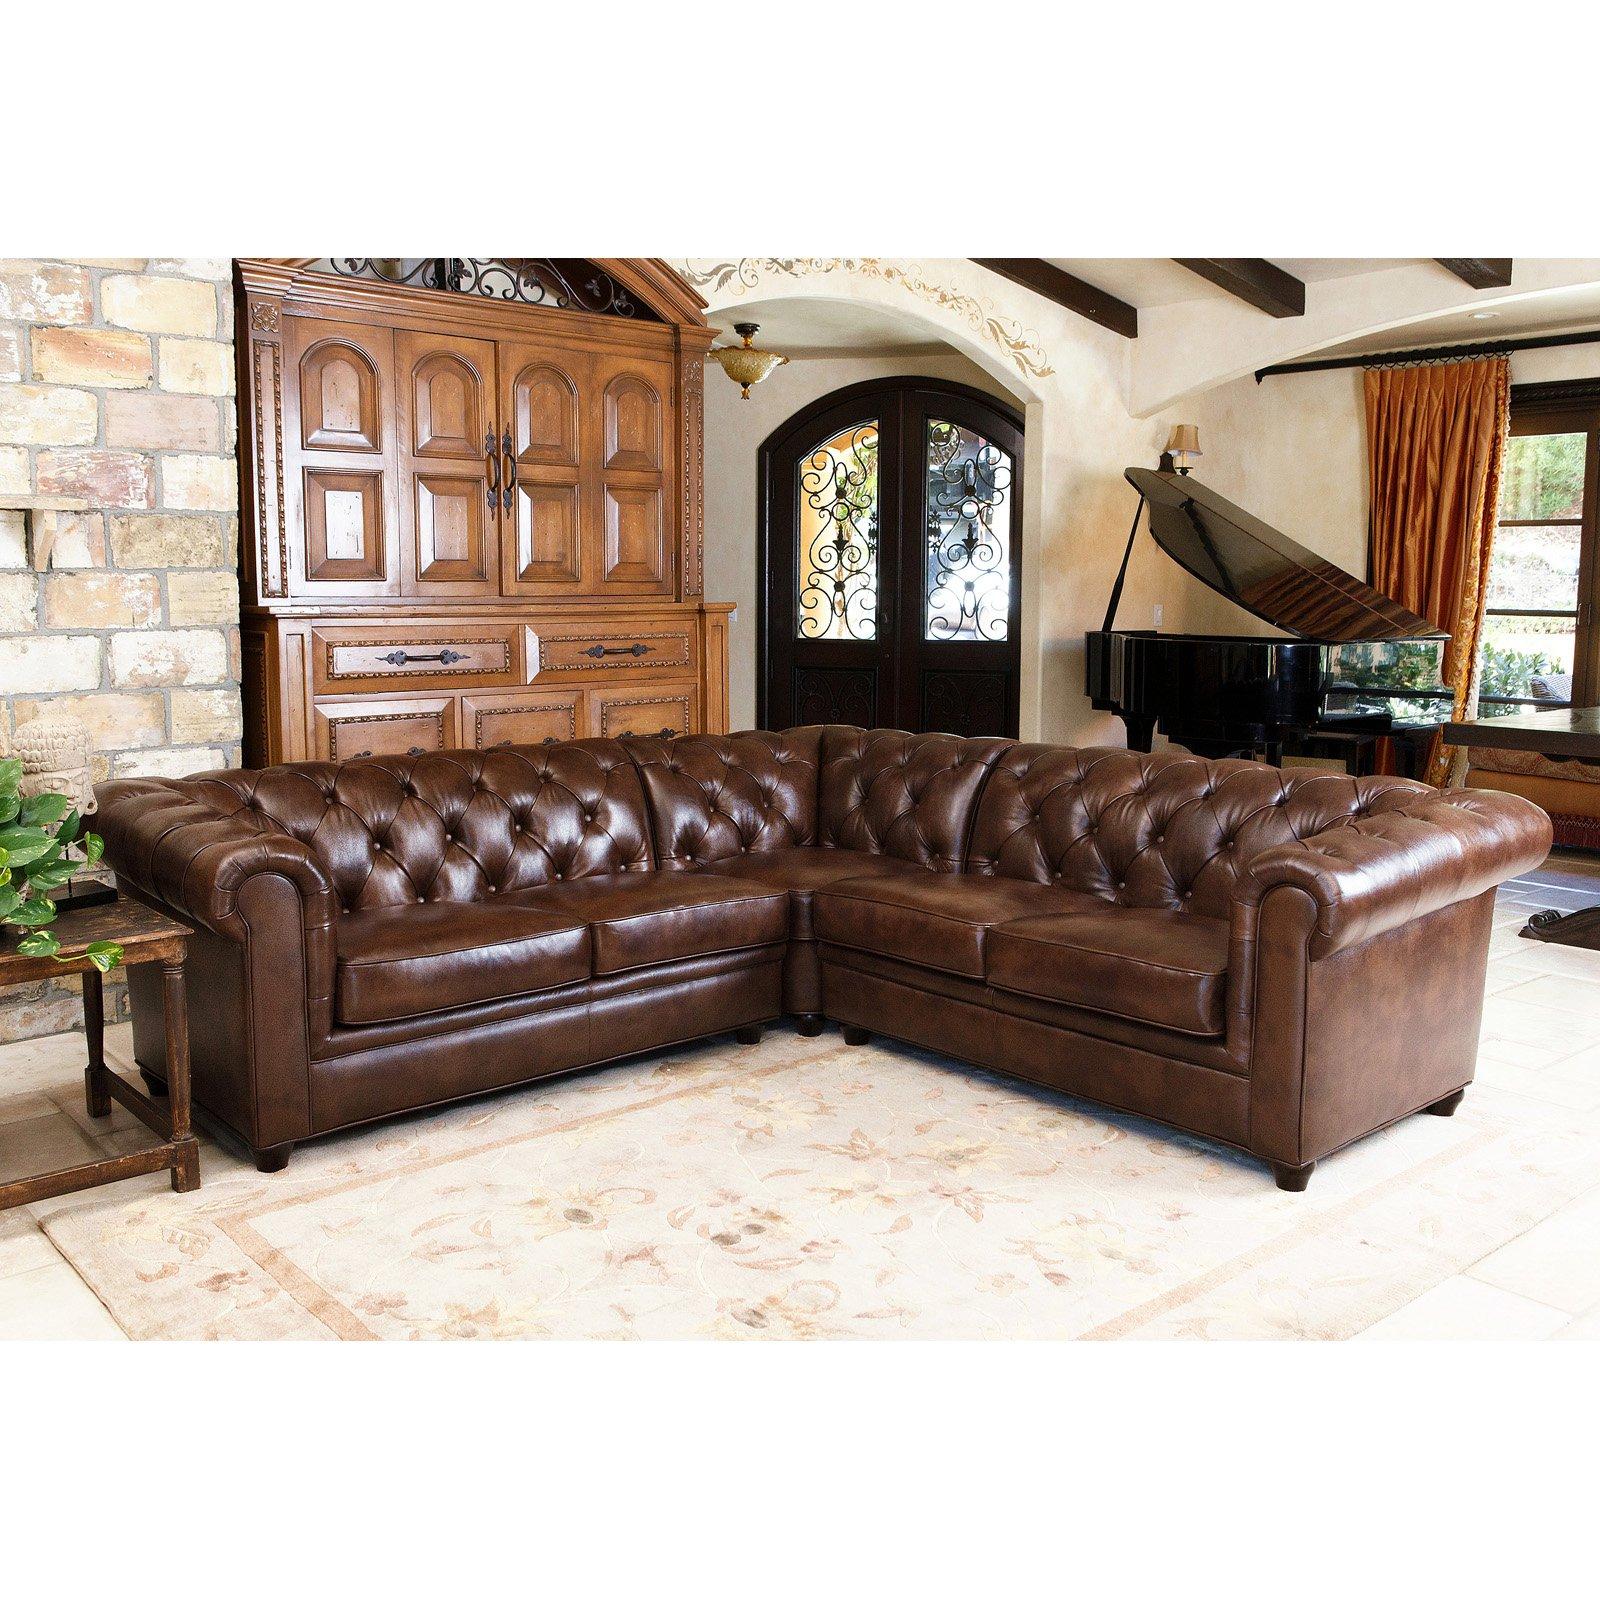 Abbyson Tuscan Top Grain Leather 3 Piece Sectional Sofa